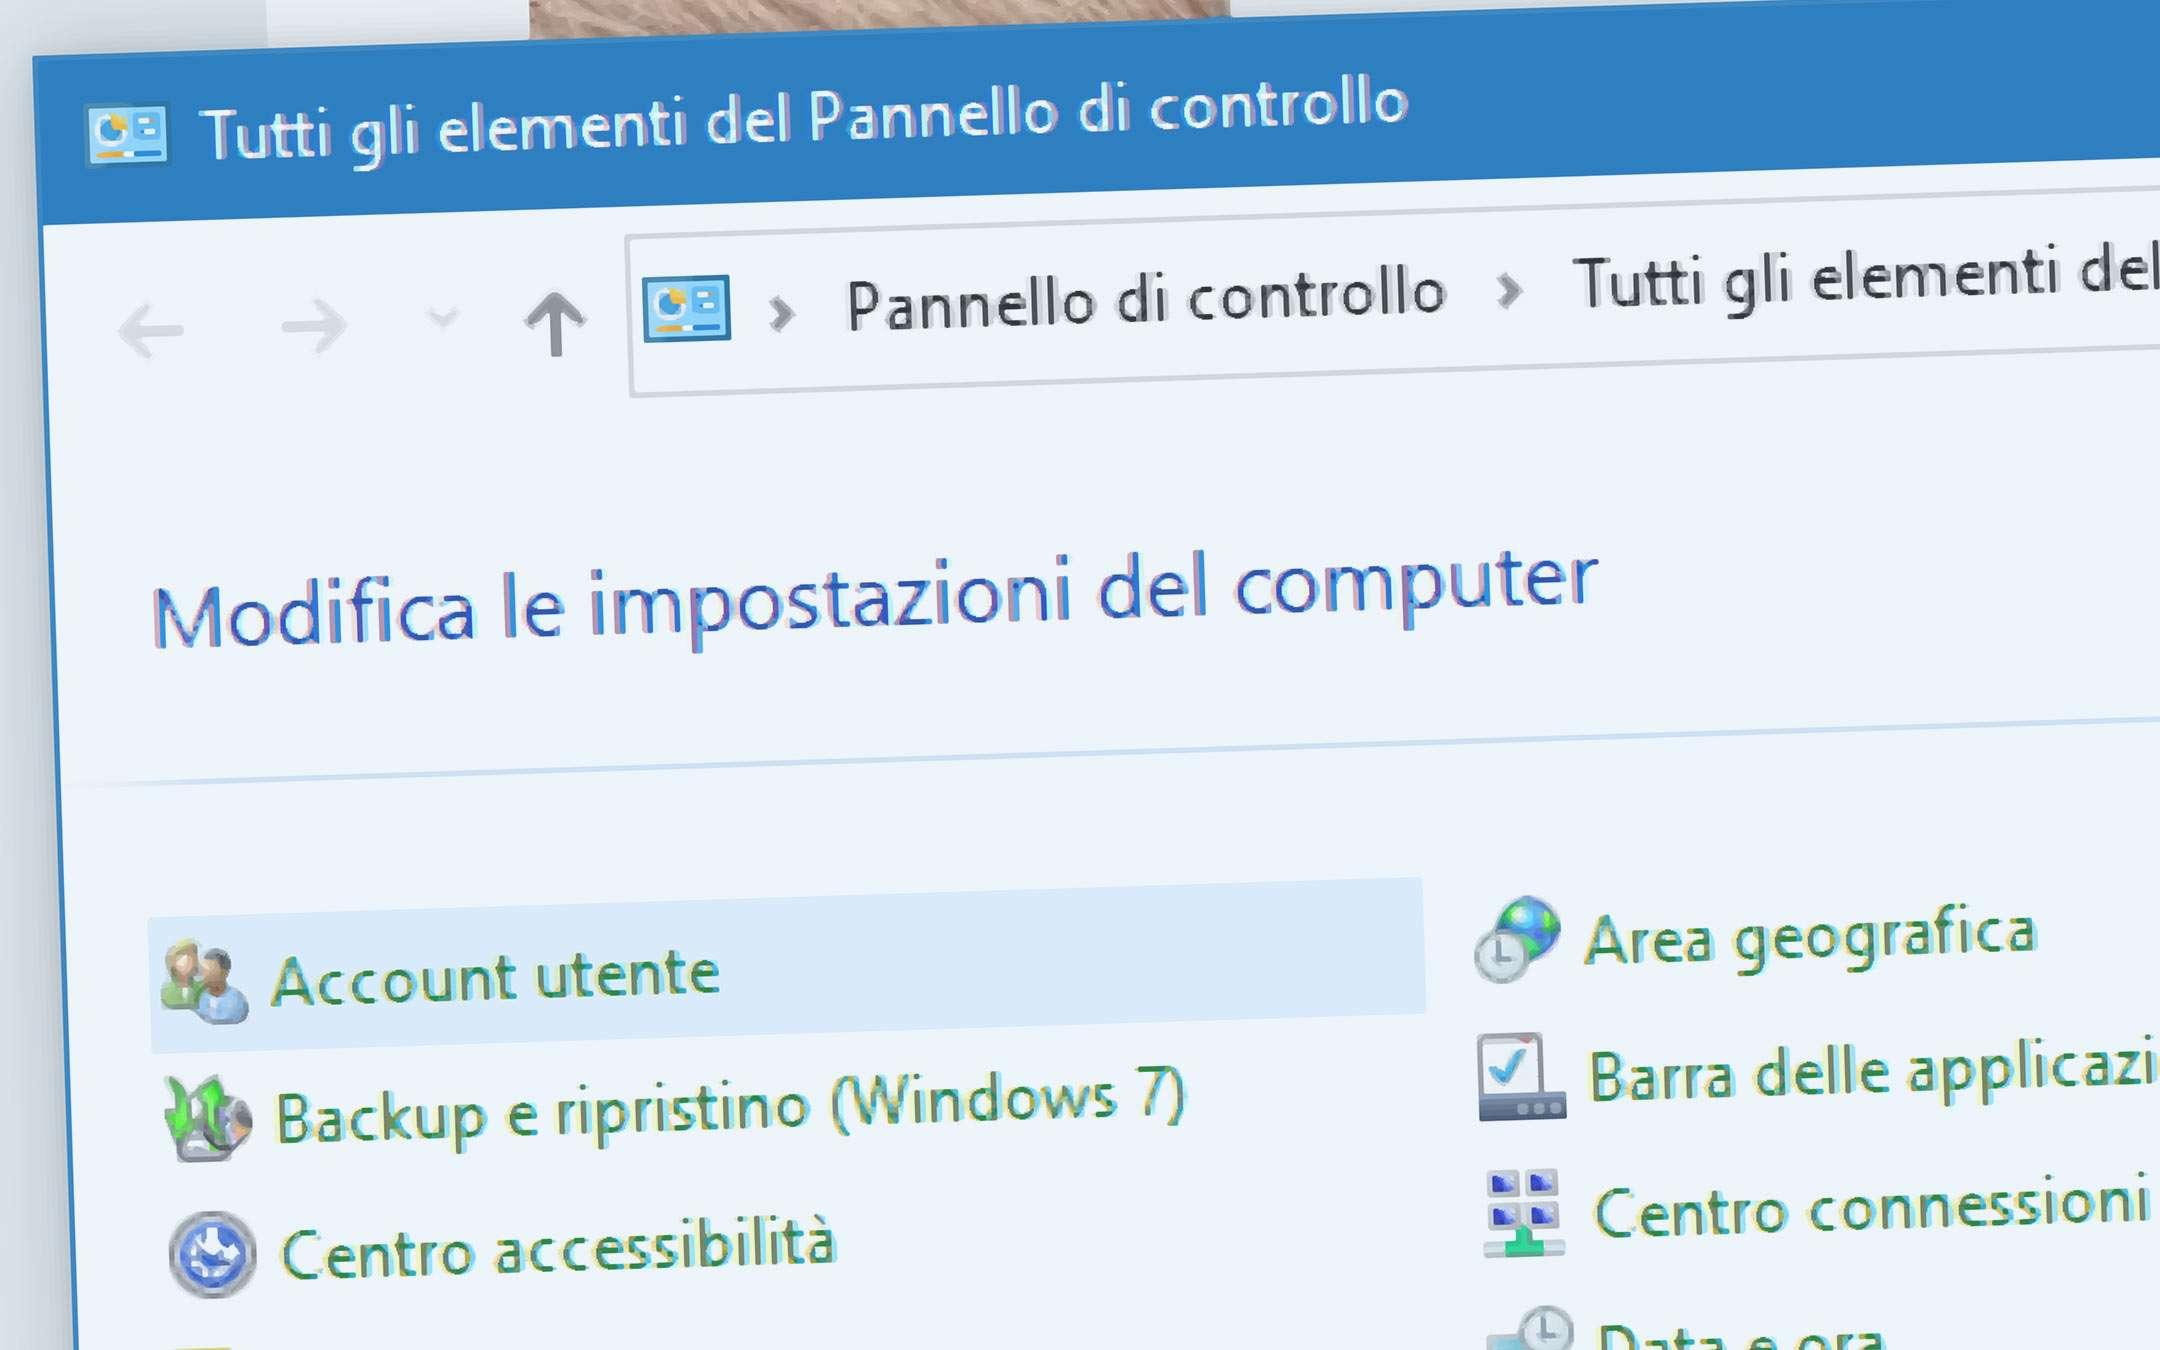 Windows 10: goodbye to the Control Panel?